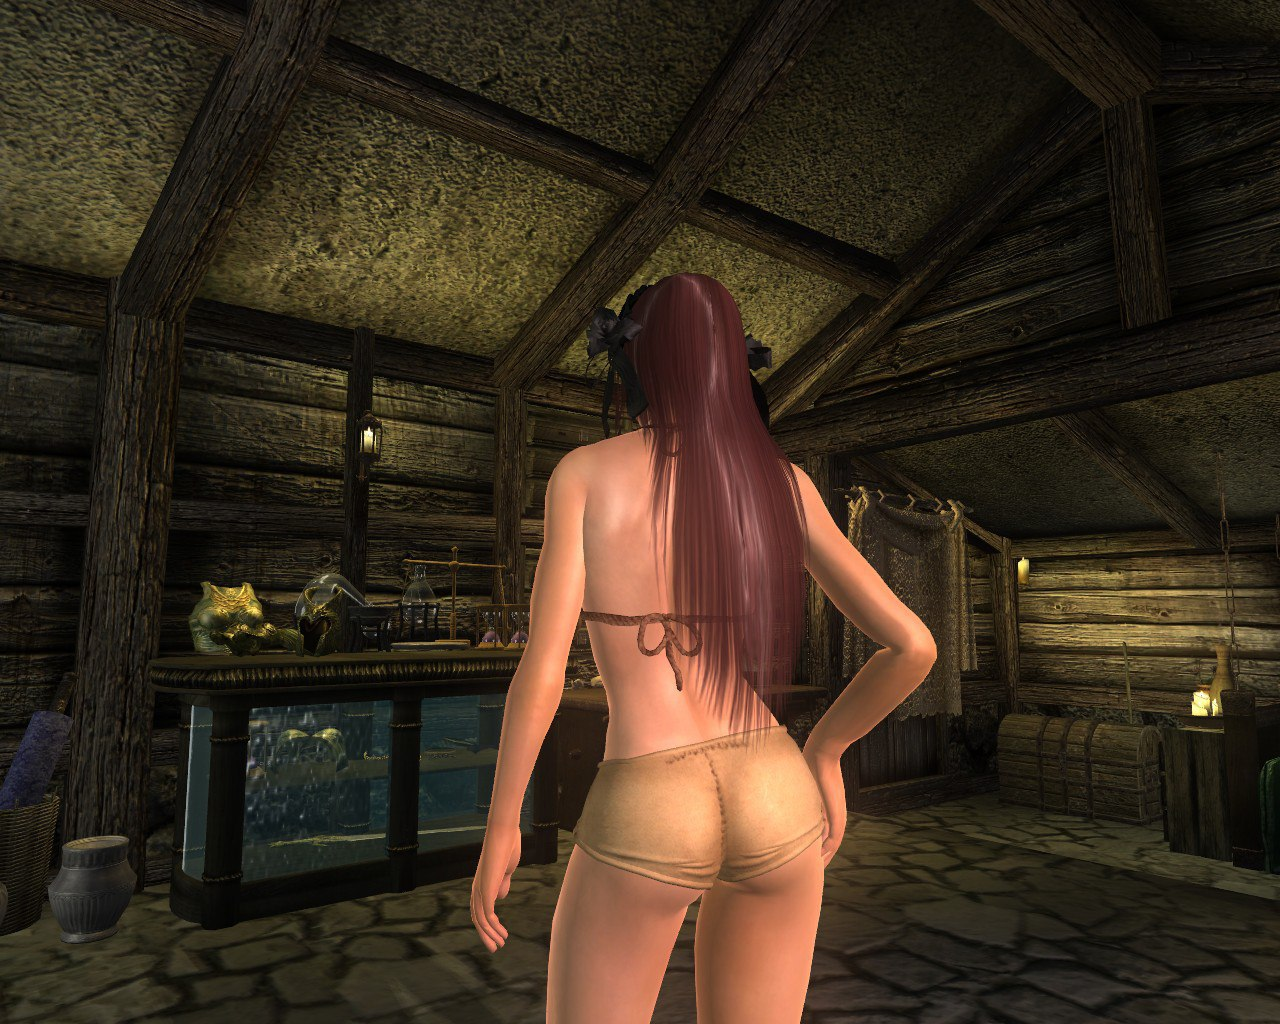 Naked public oblivion fat mod pornstar